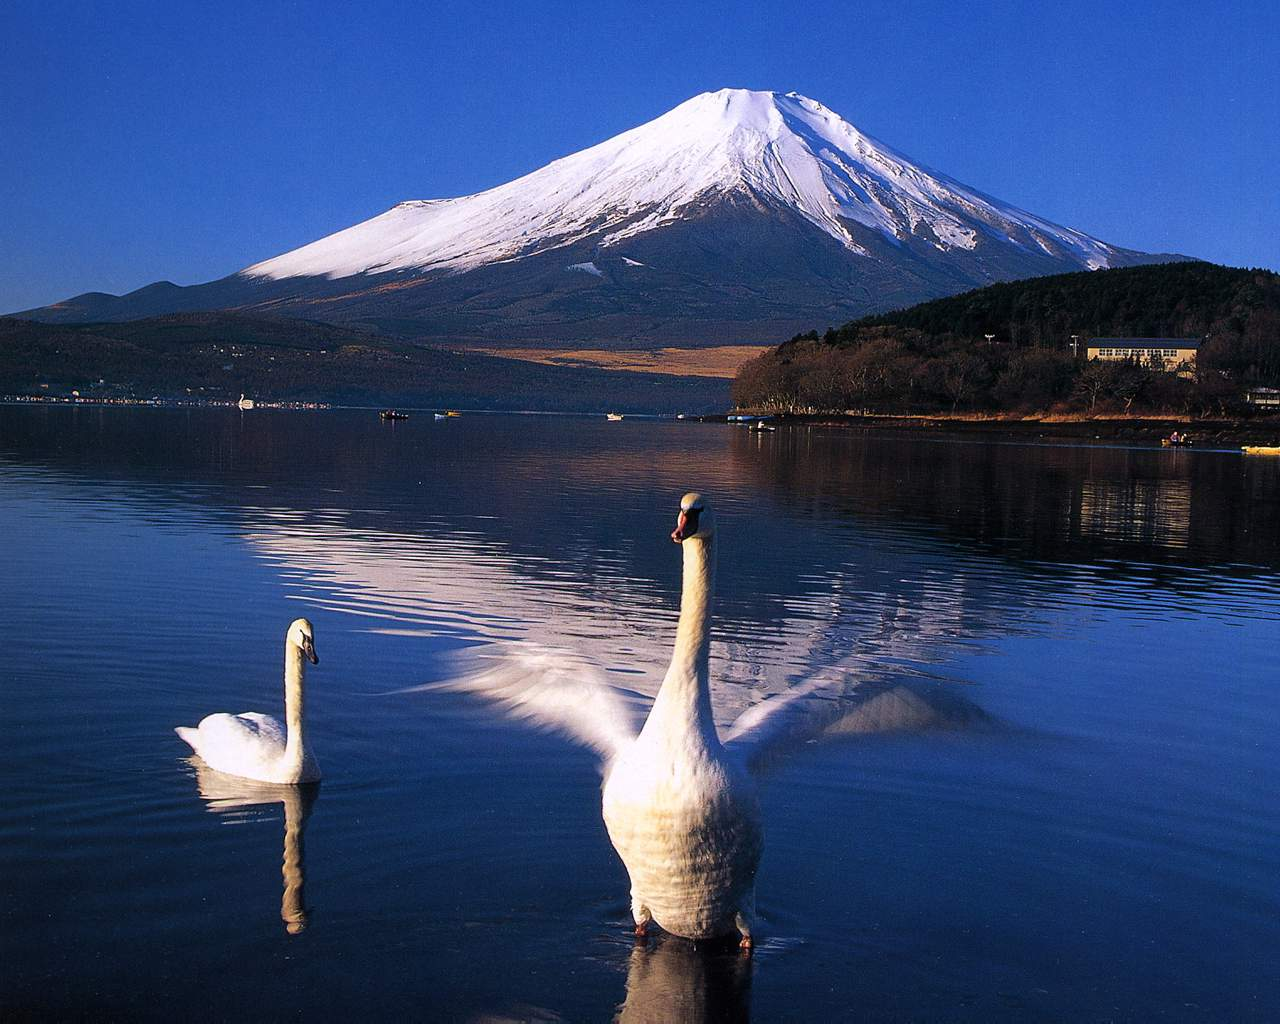 富士山の壁紙 富士の響 富士山写真 壁紙